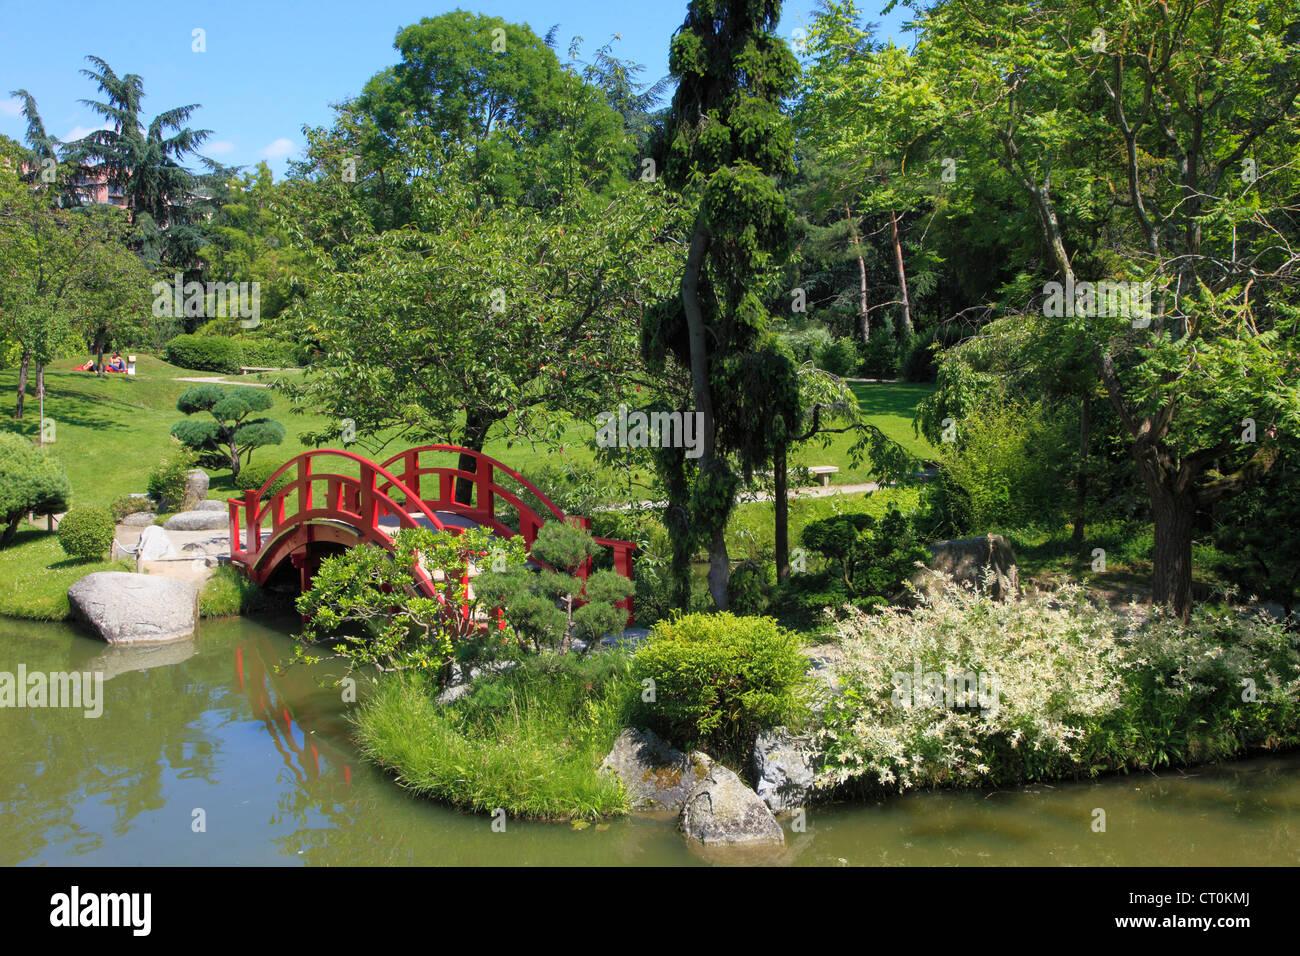 Jardin Japonais Stock Photos & Jardin Japonais Stock Images - Alamy